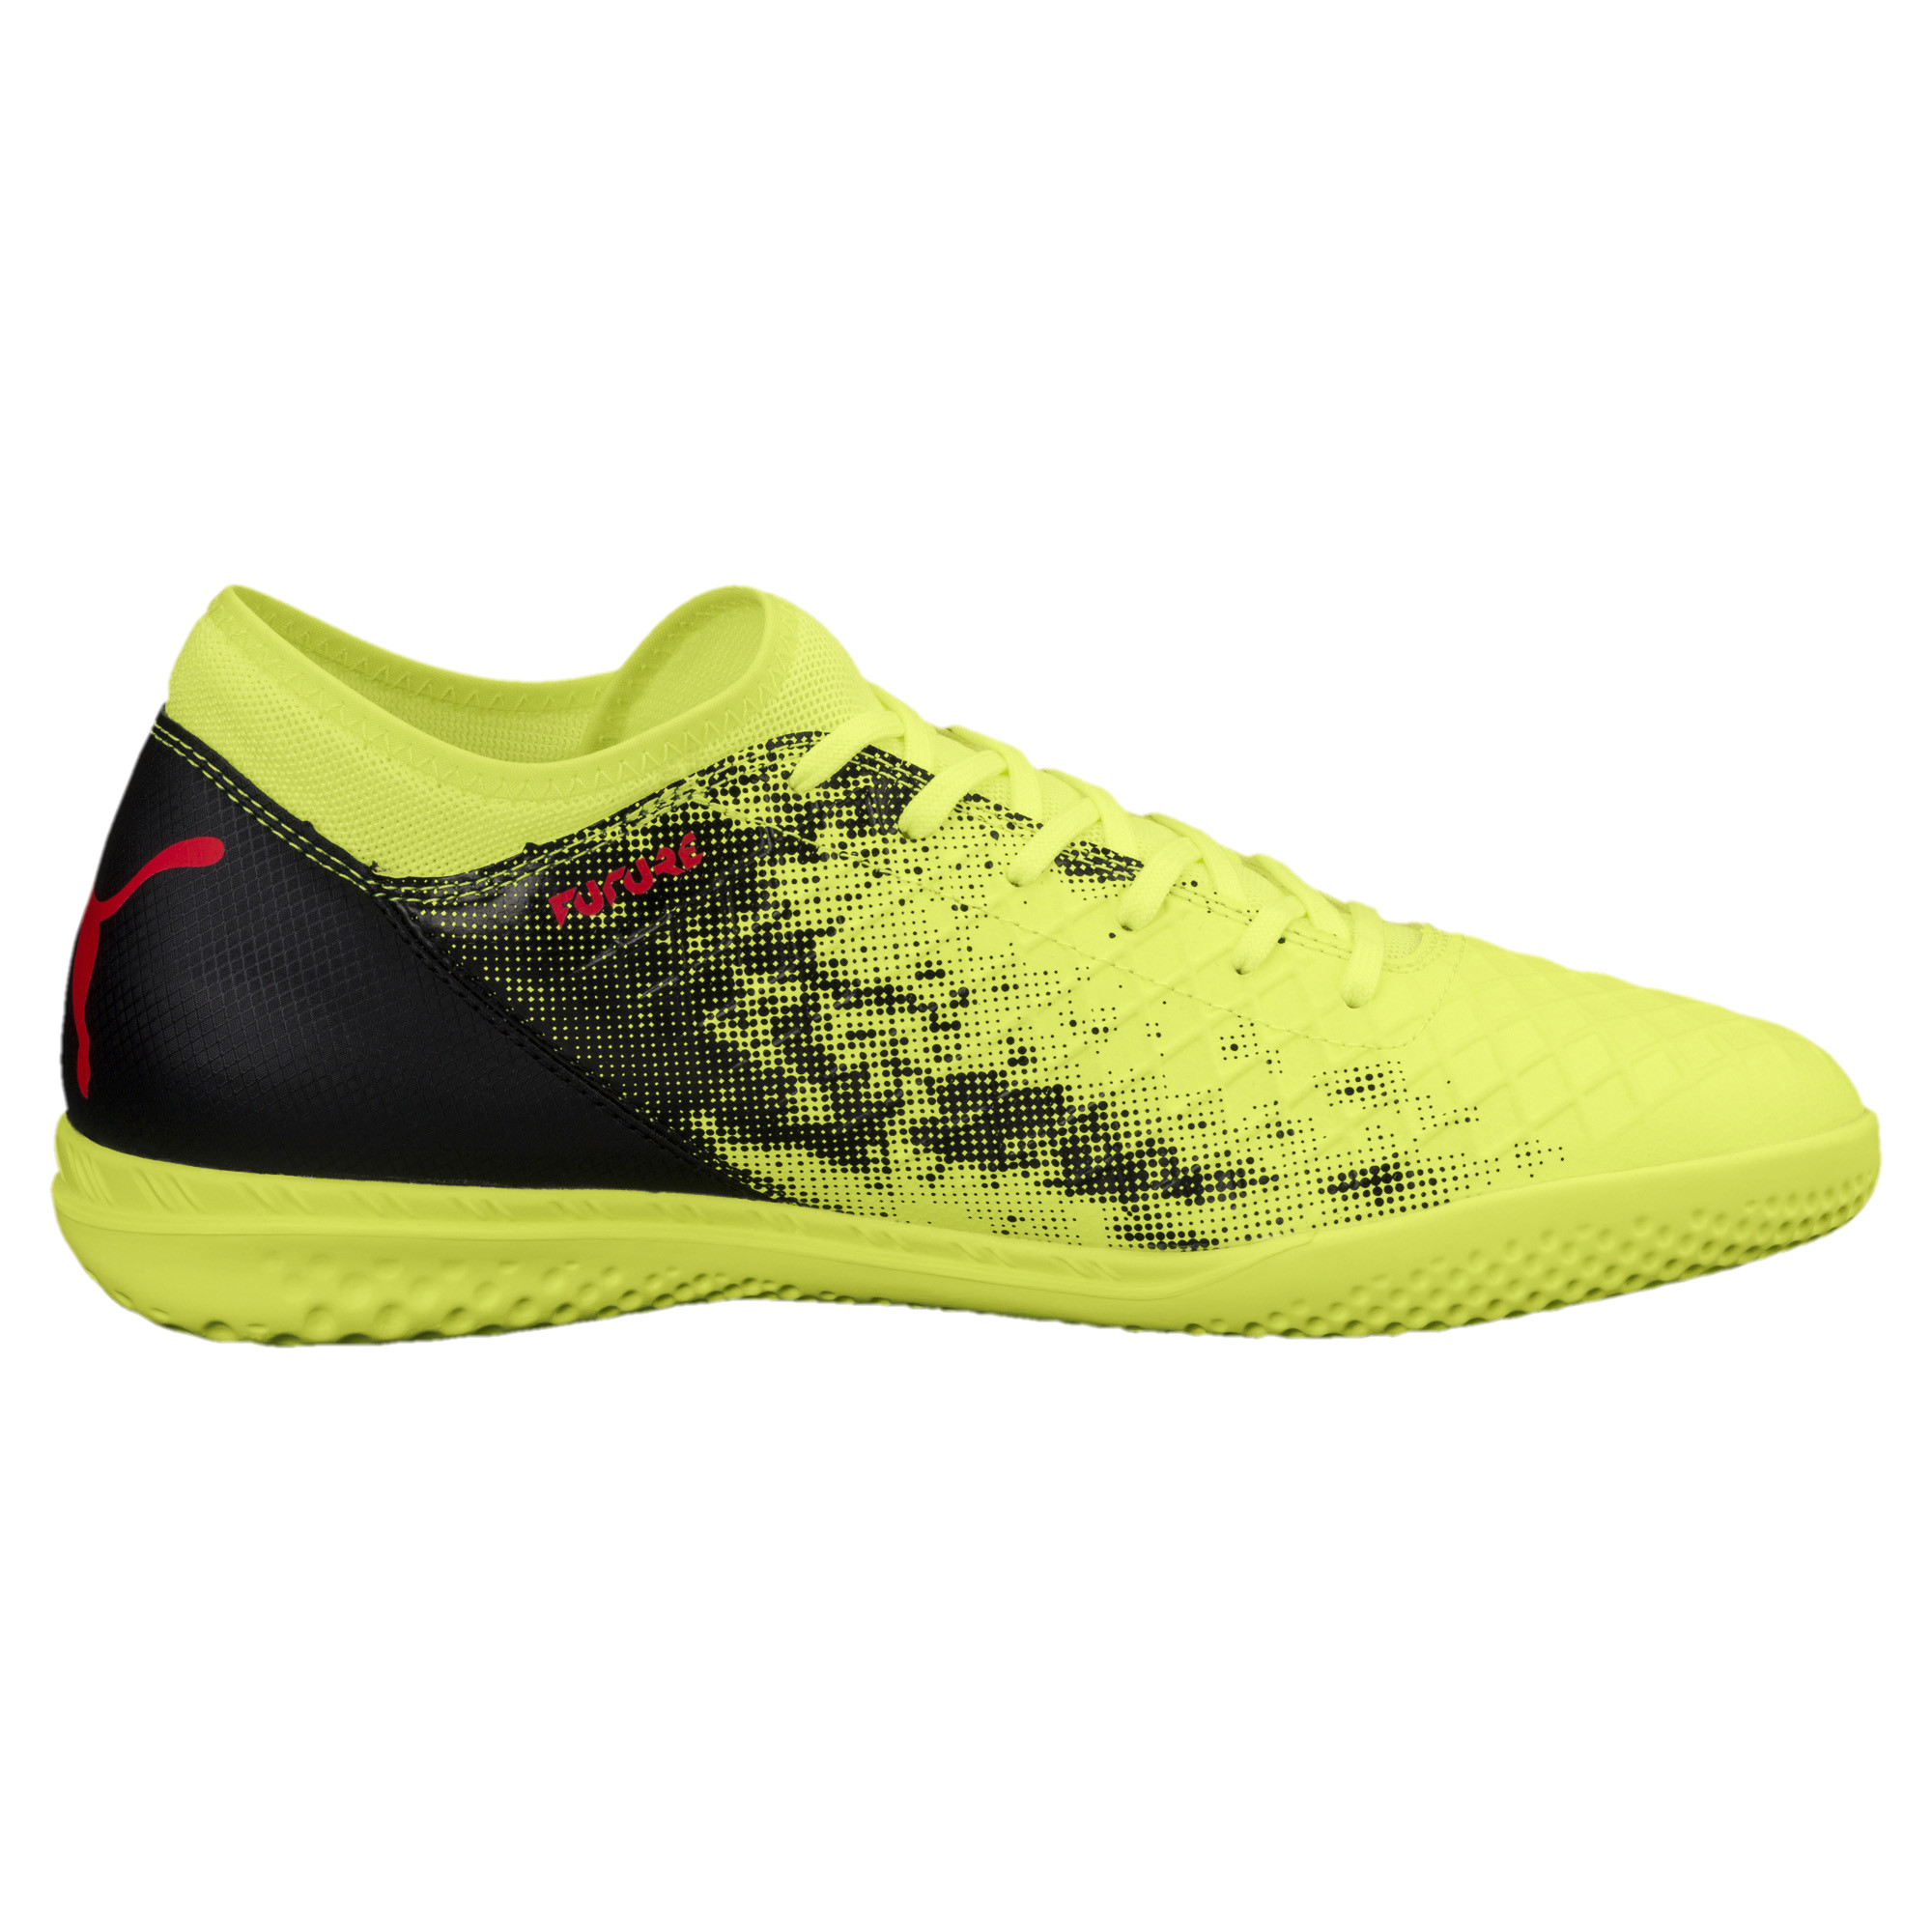 Image Puma Men's FUTURE 18.4 IT Football Boots #3